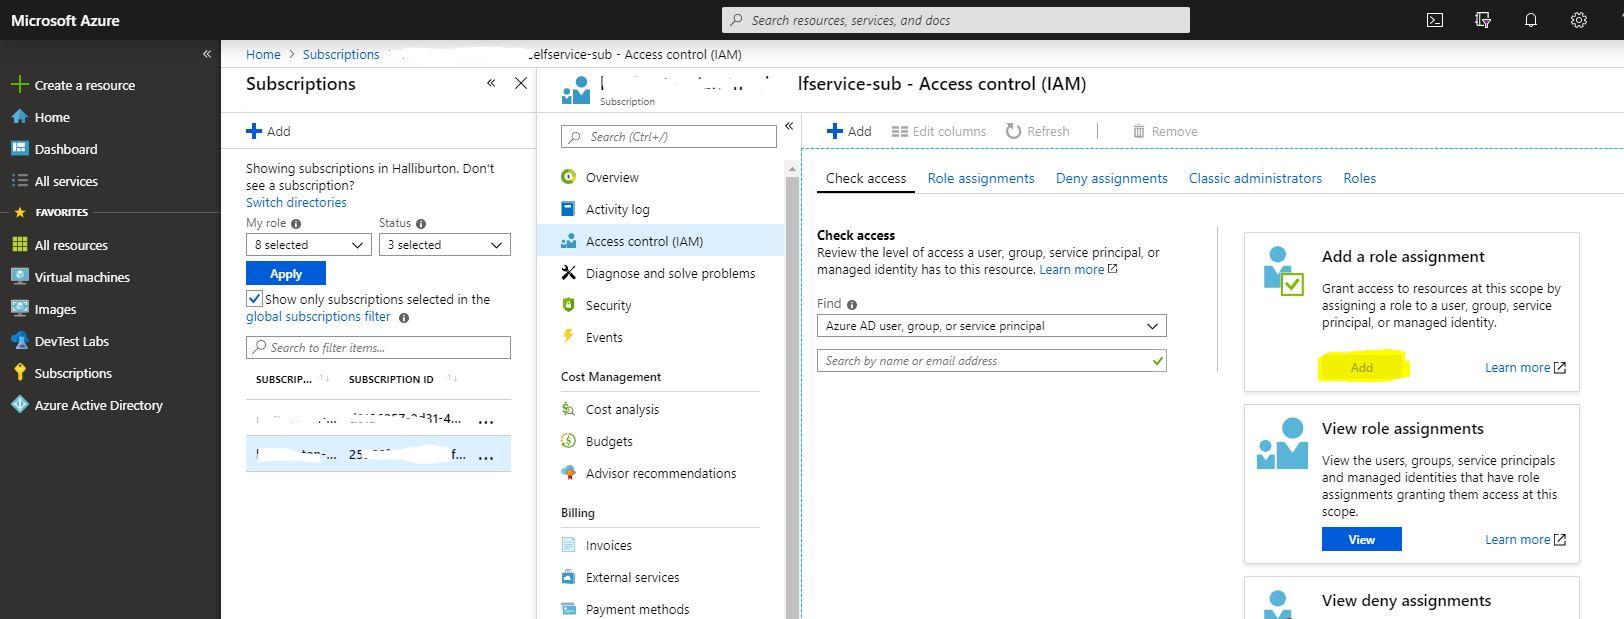 Строим пайплайн автоматизированного тестирования на Azure DevOps - 4